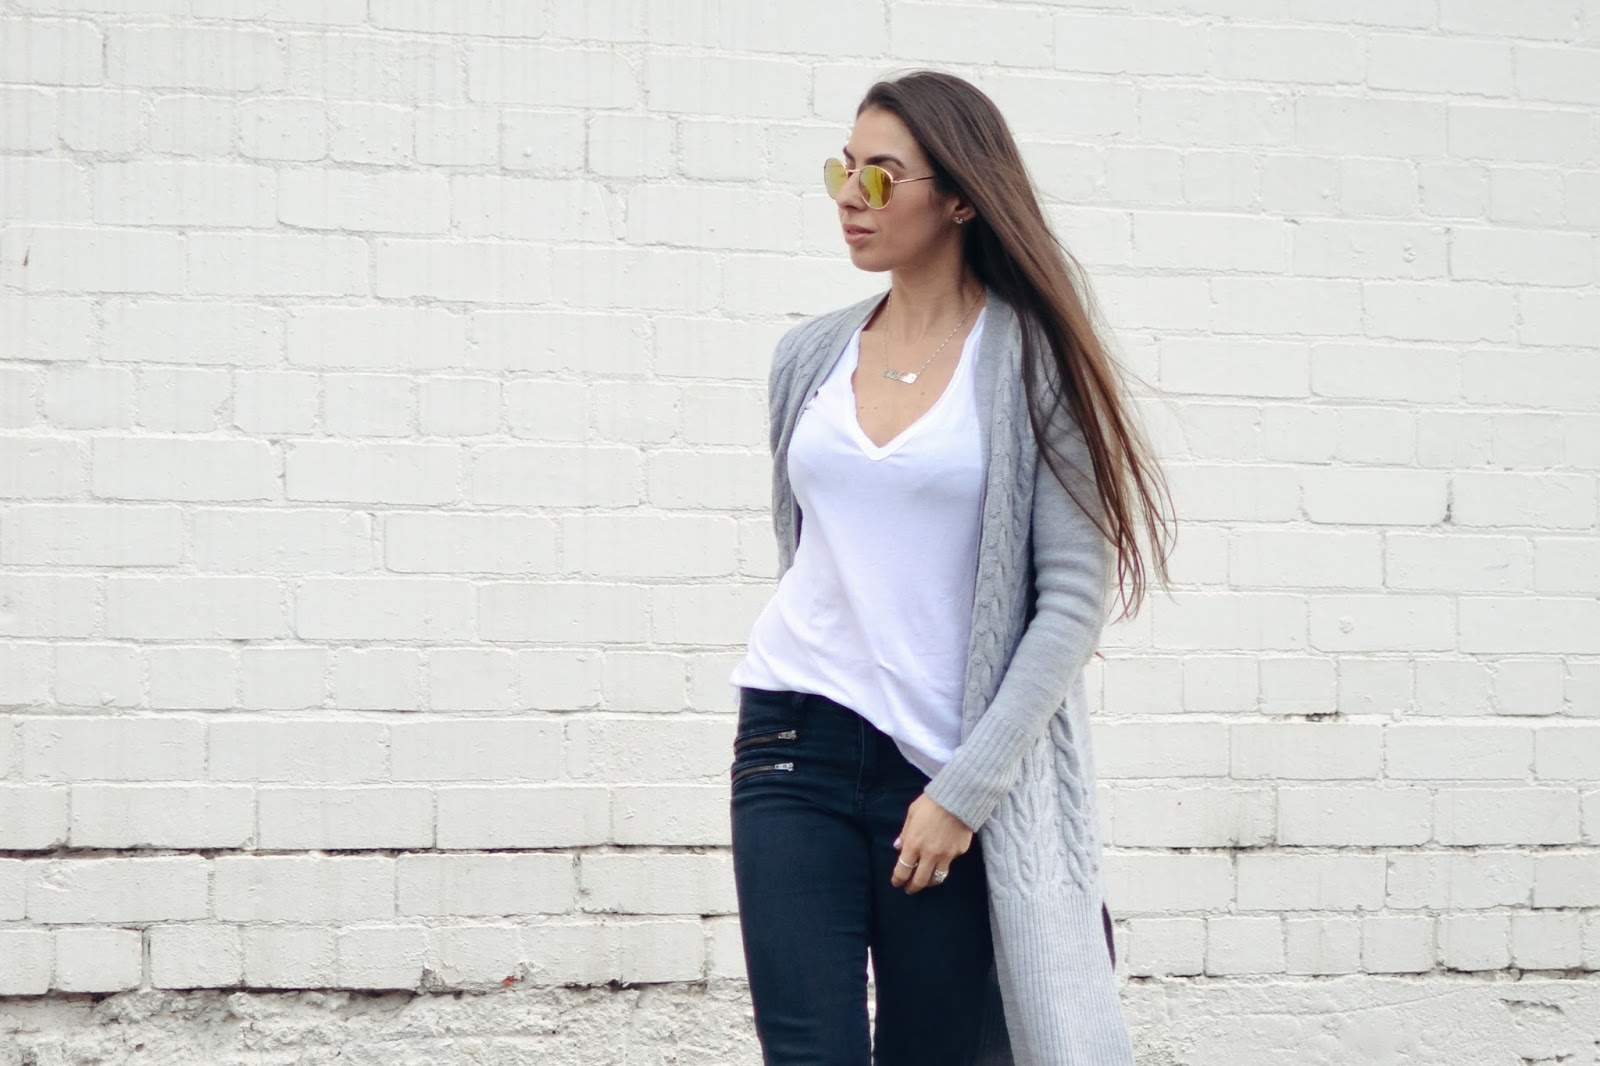 Michelle 39 S Style File Melbourne Fashion Blog